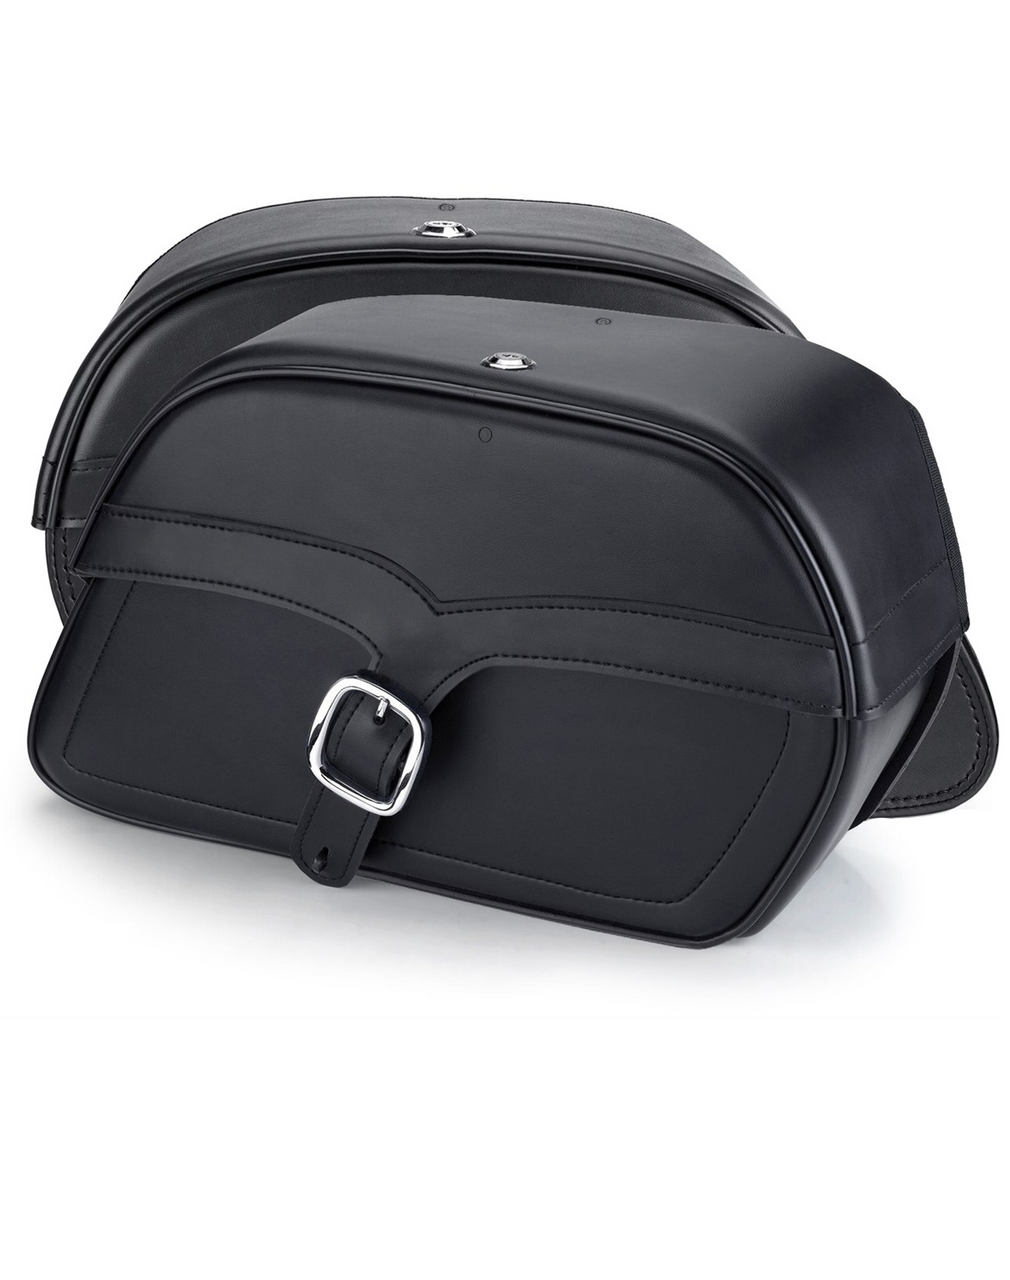 Honda VTX 1800 C Charger Single Strap Large Motorcycle Saddlebags Both Bags View